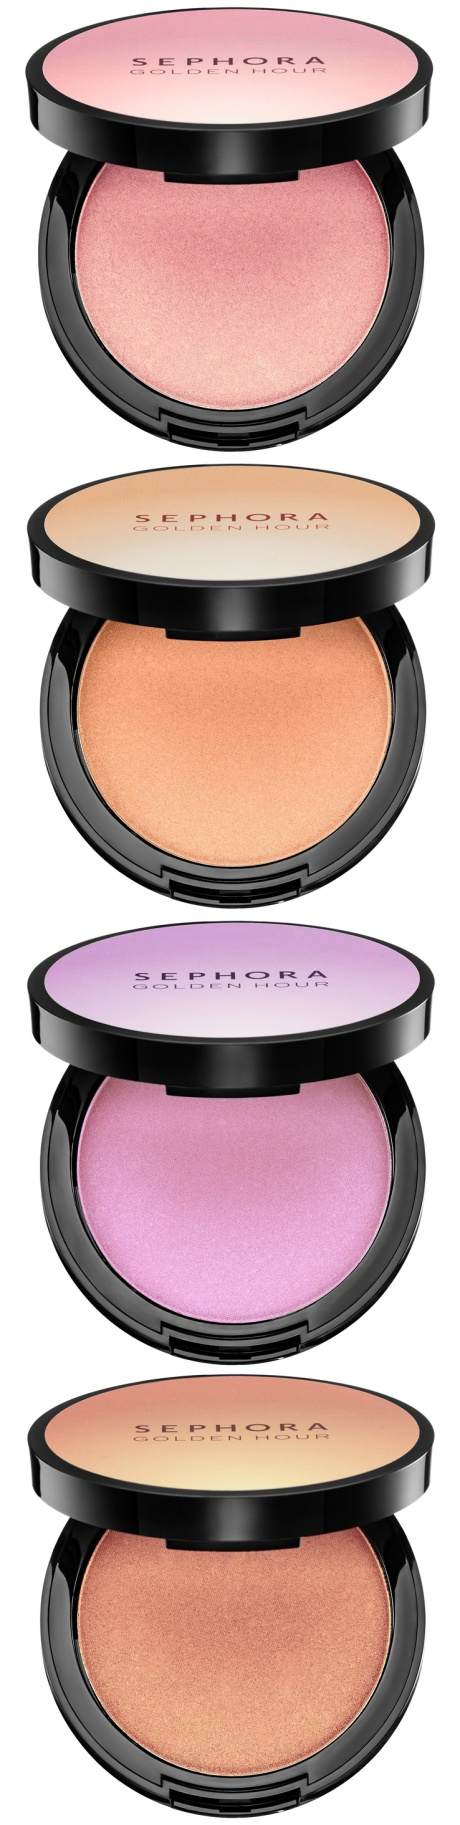 Sephora-Golden-Hour-Highlighting-Powder